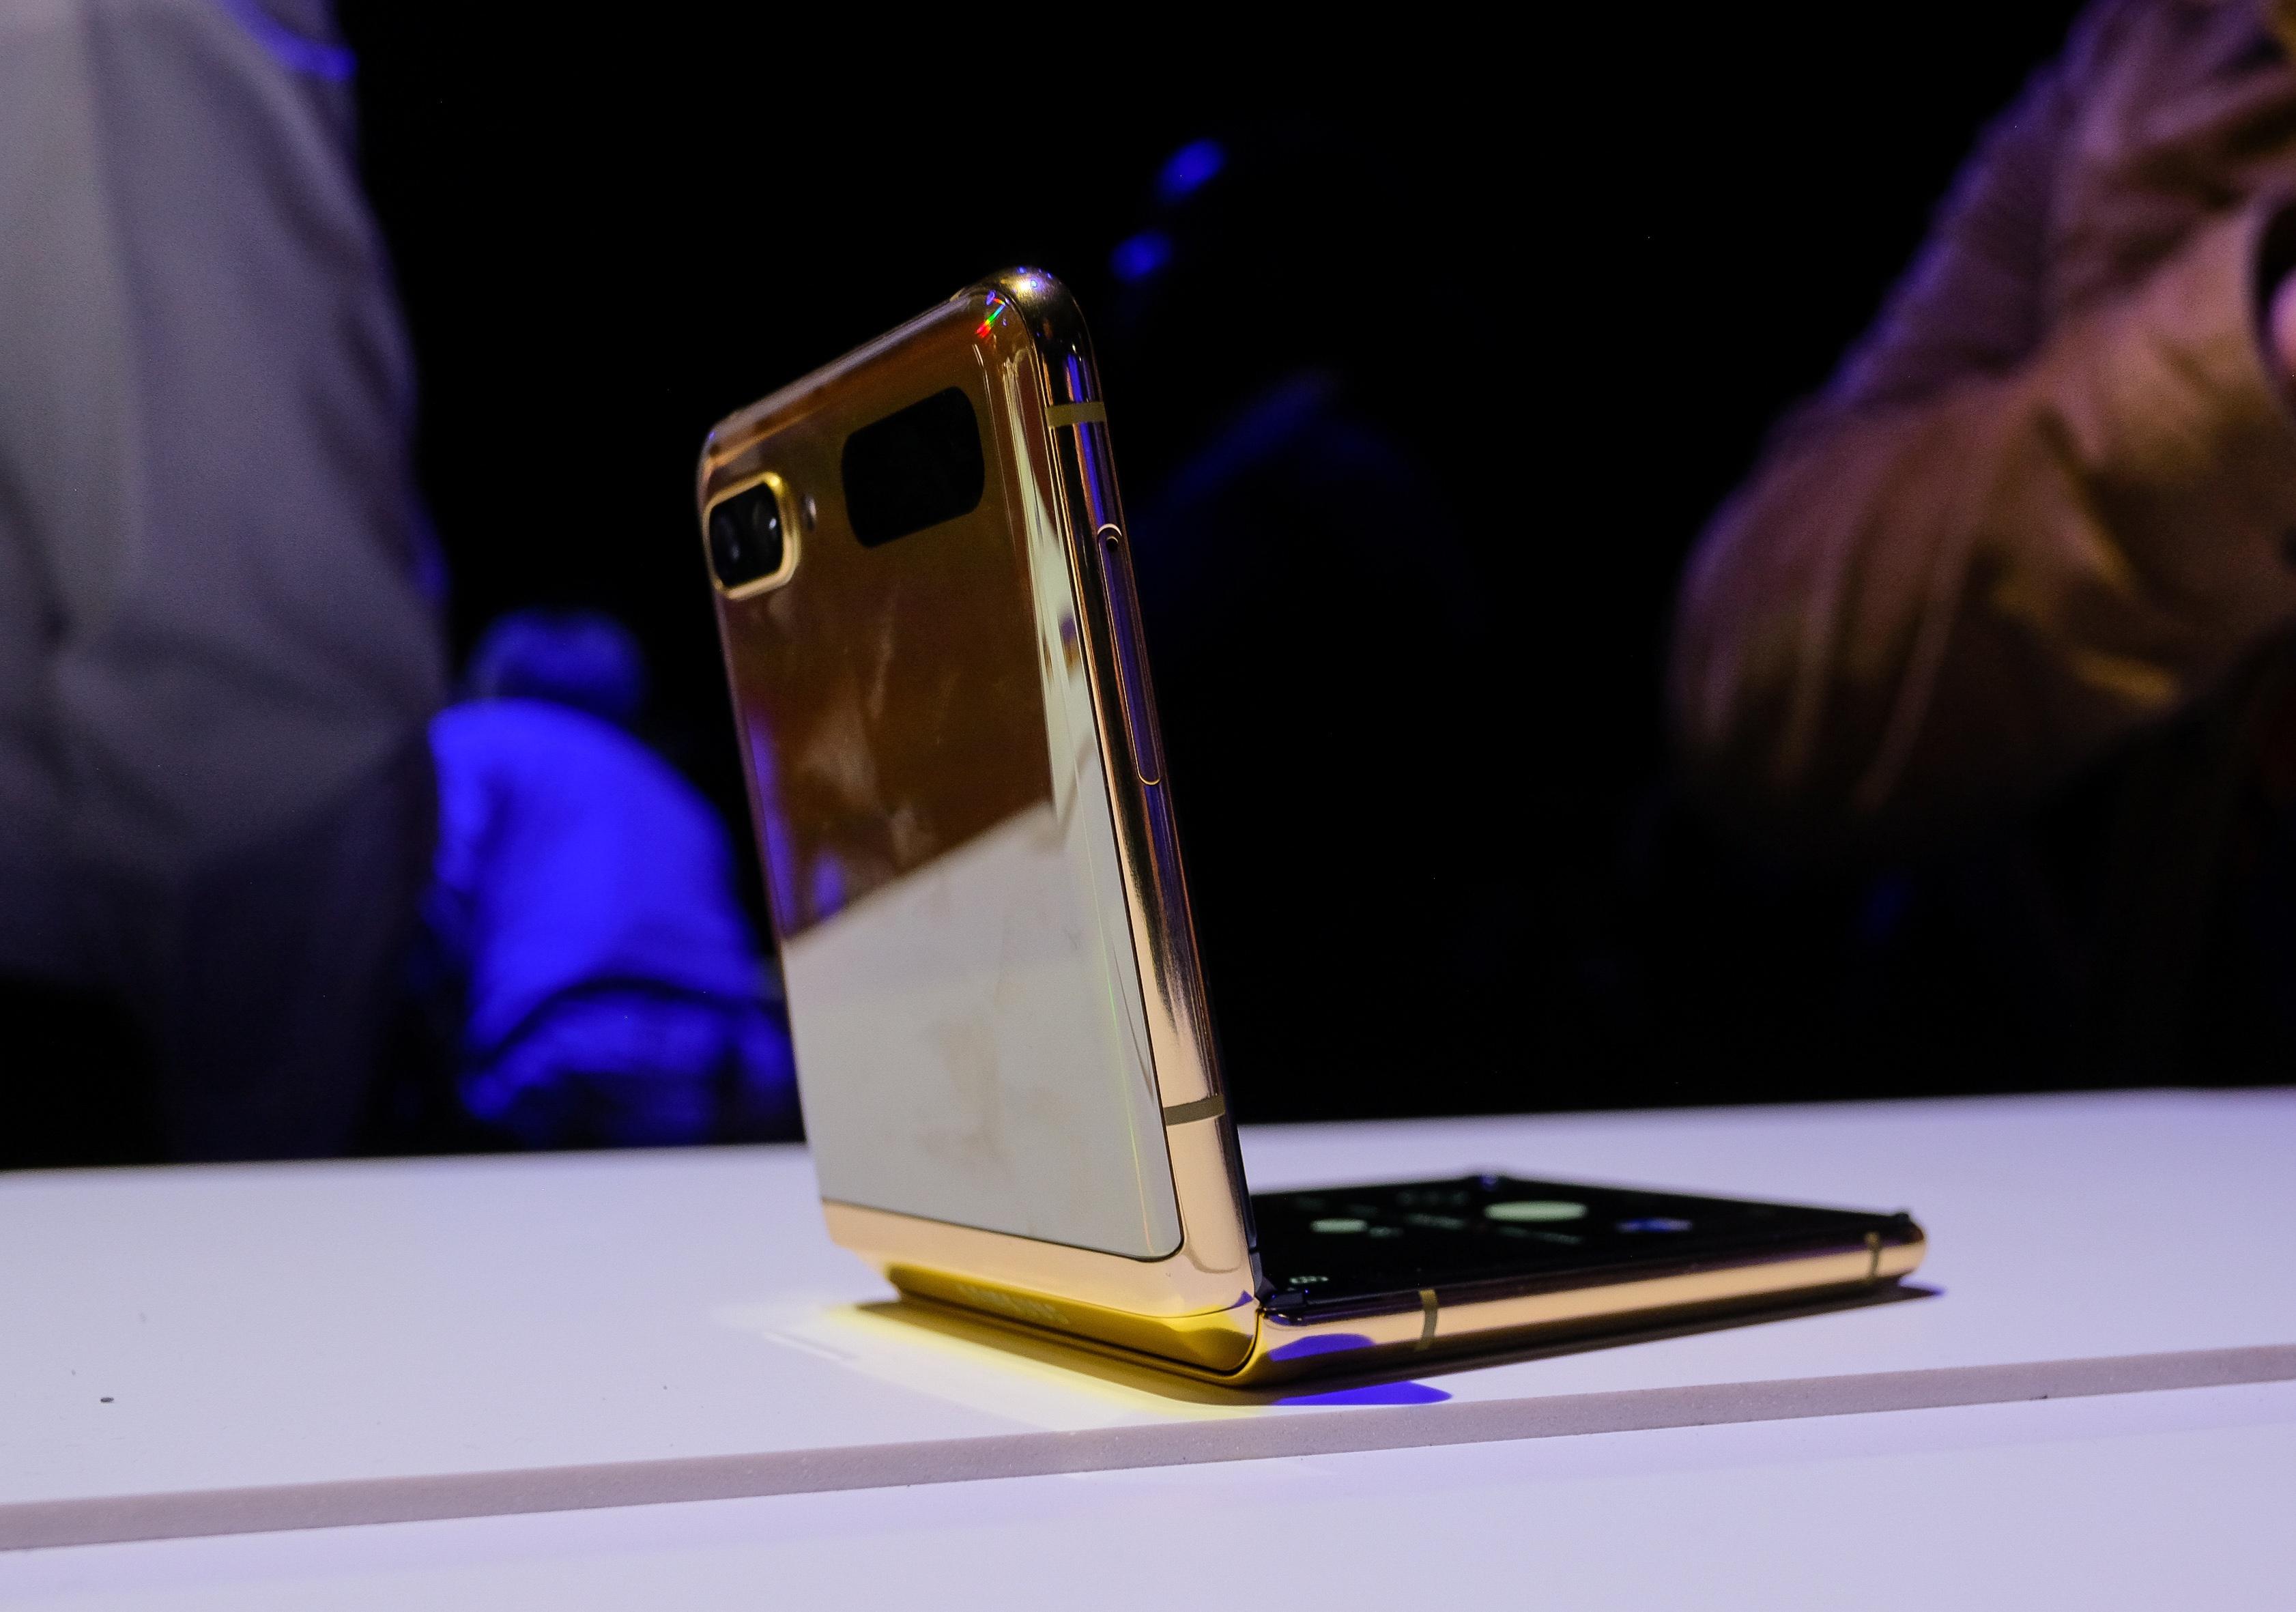 Anh thuc te Galaxy Z Flip - cach mang moi cua Samsung hinh anh 7 galaxy_s20_zing_3262.jpg